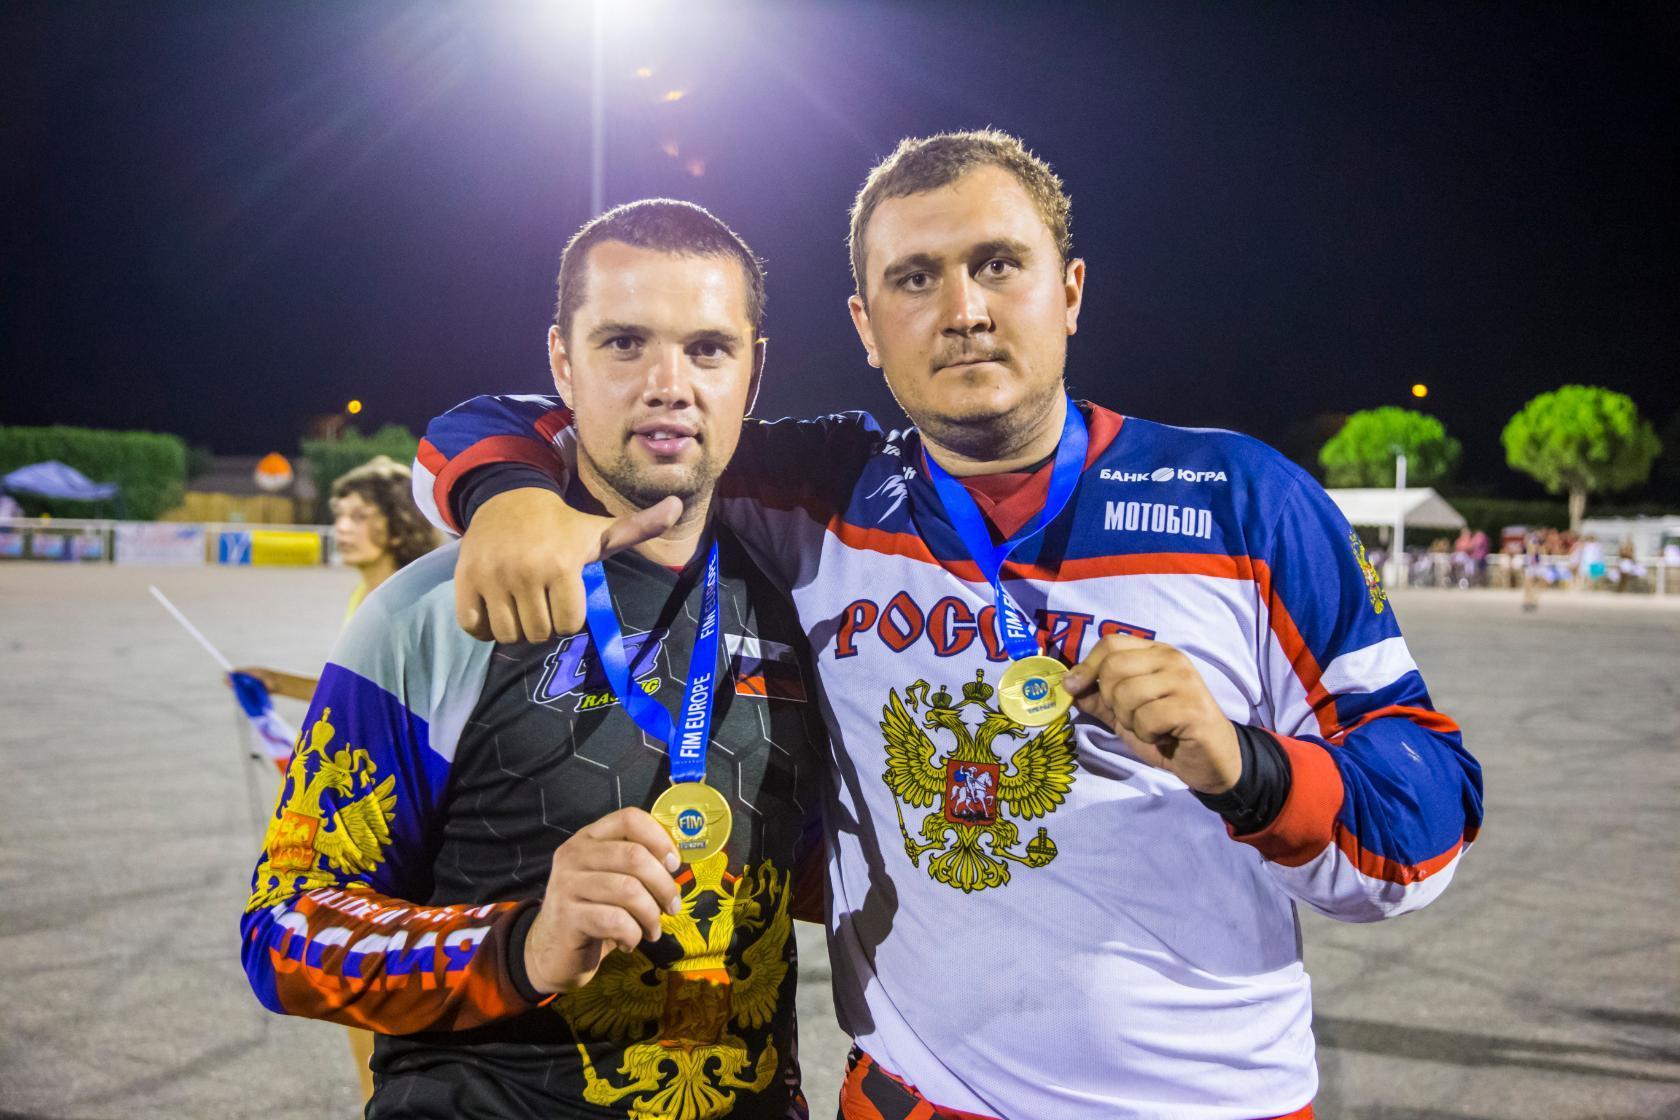 Алексей Молодушко и Сергей Крошка (Фото: Евгений Сигида)